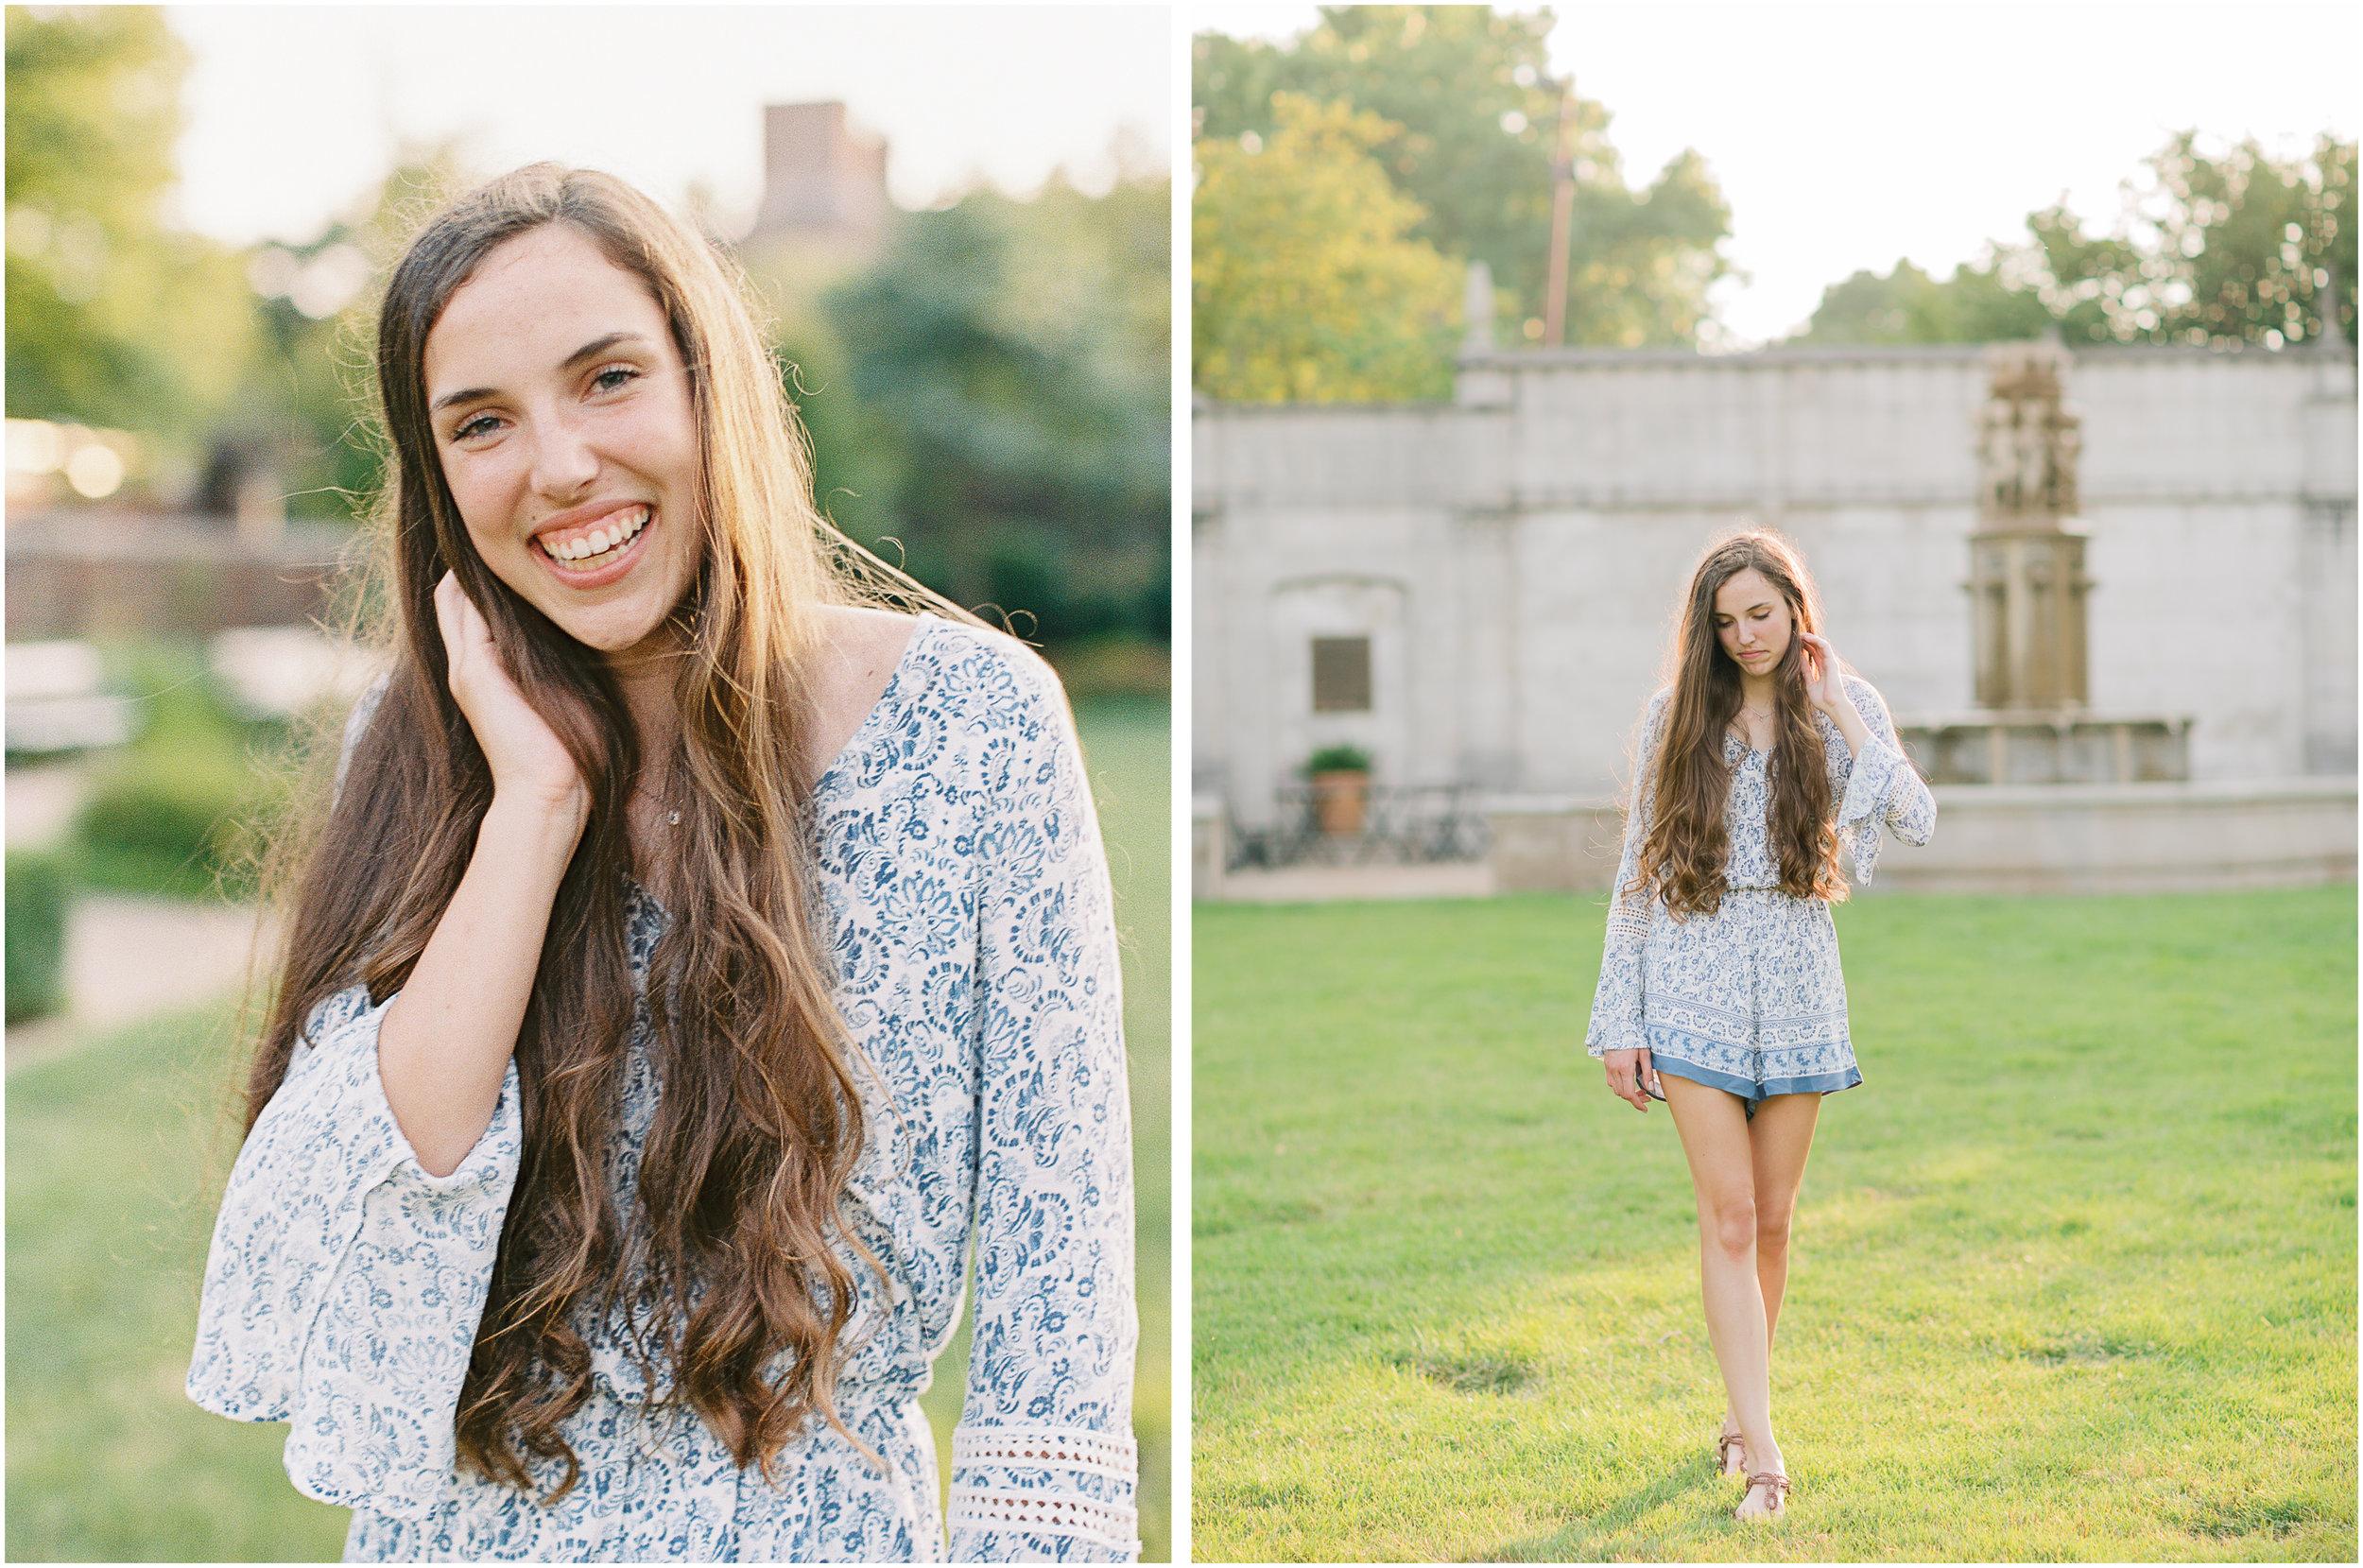 pittsburgh highschool senior photographer anna laero photography class of 2019.jpg